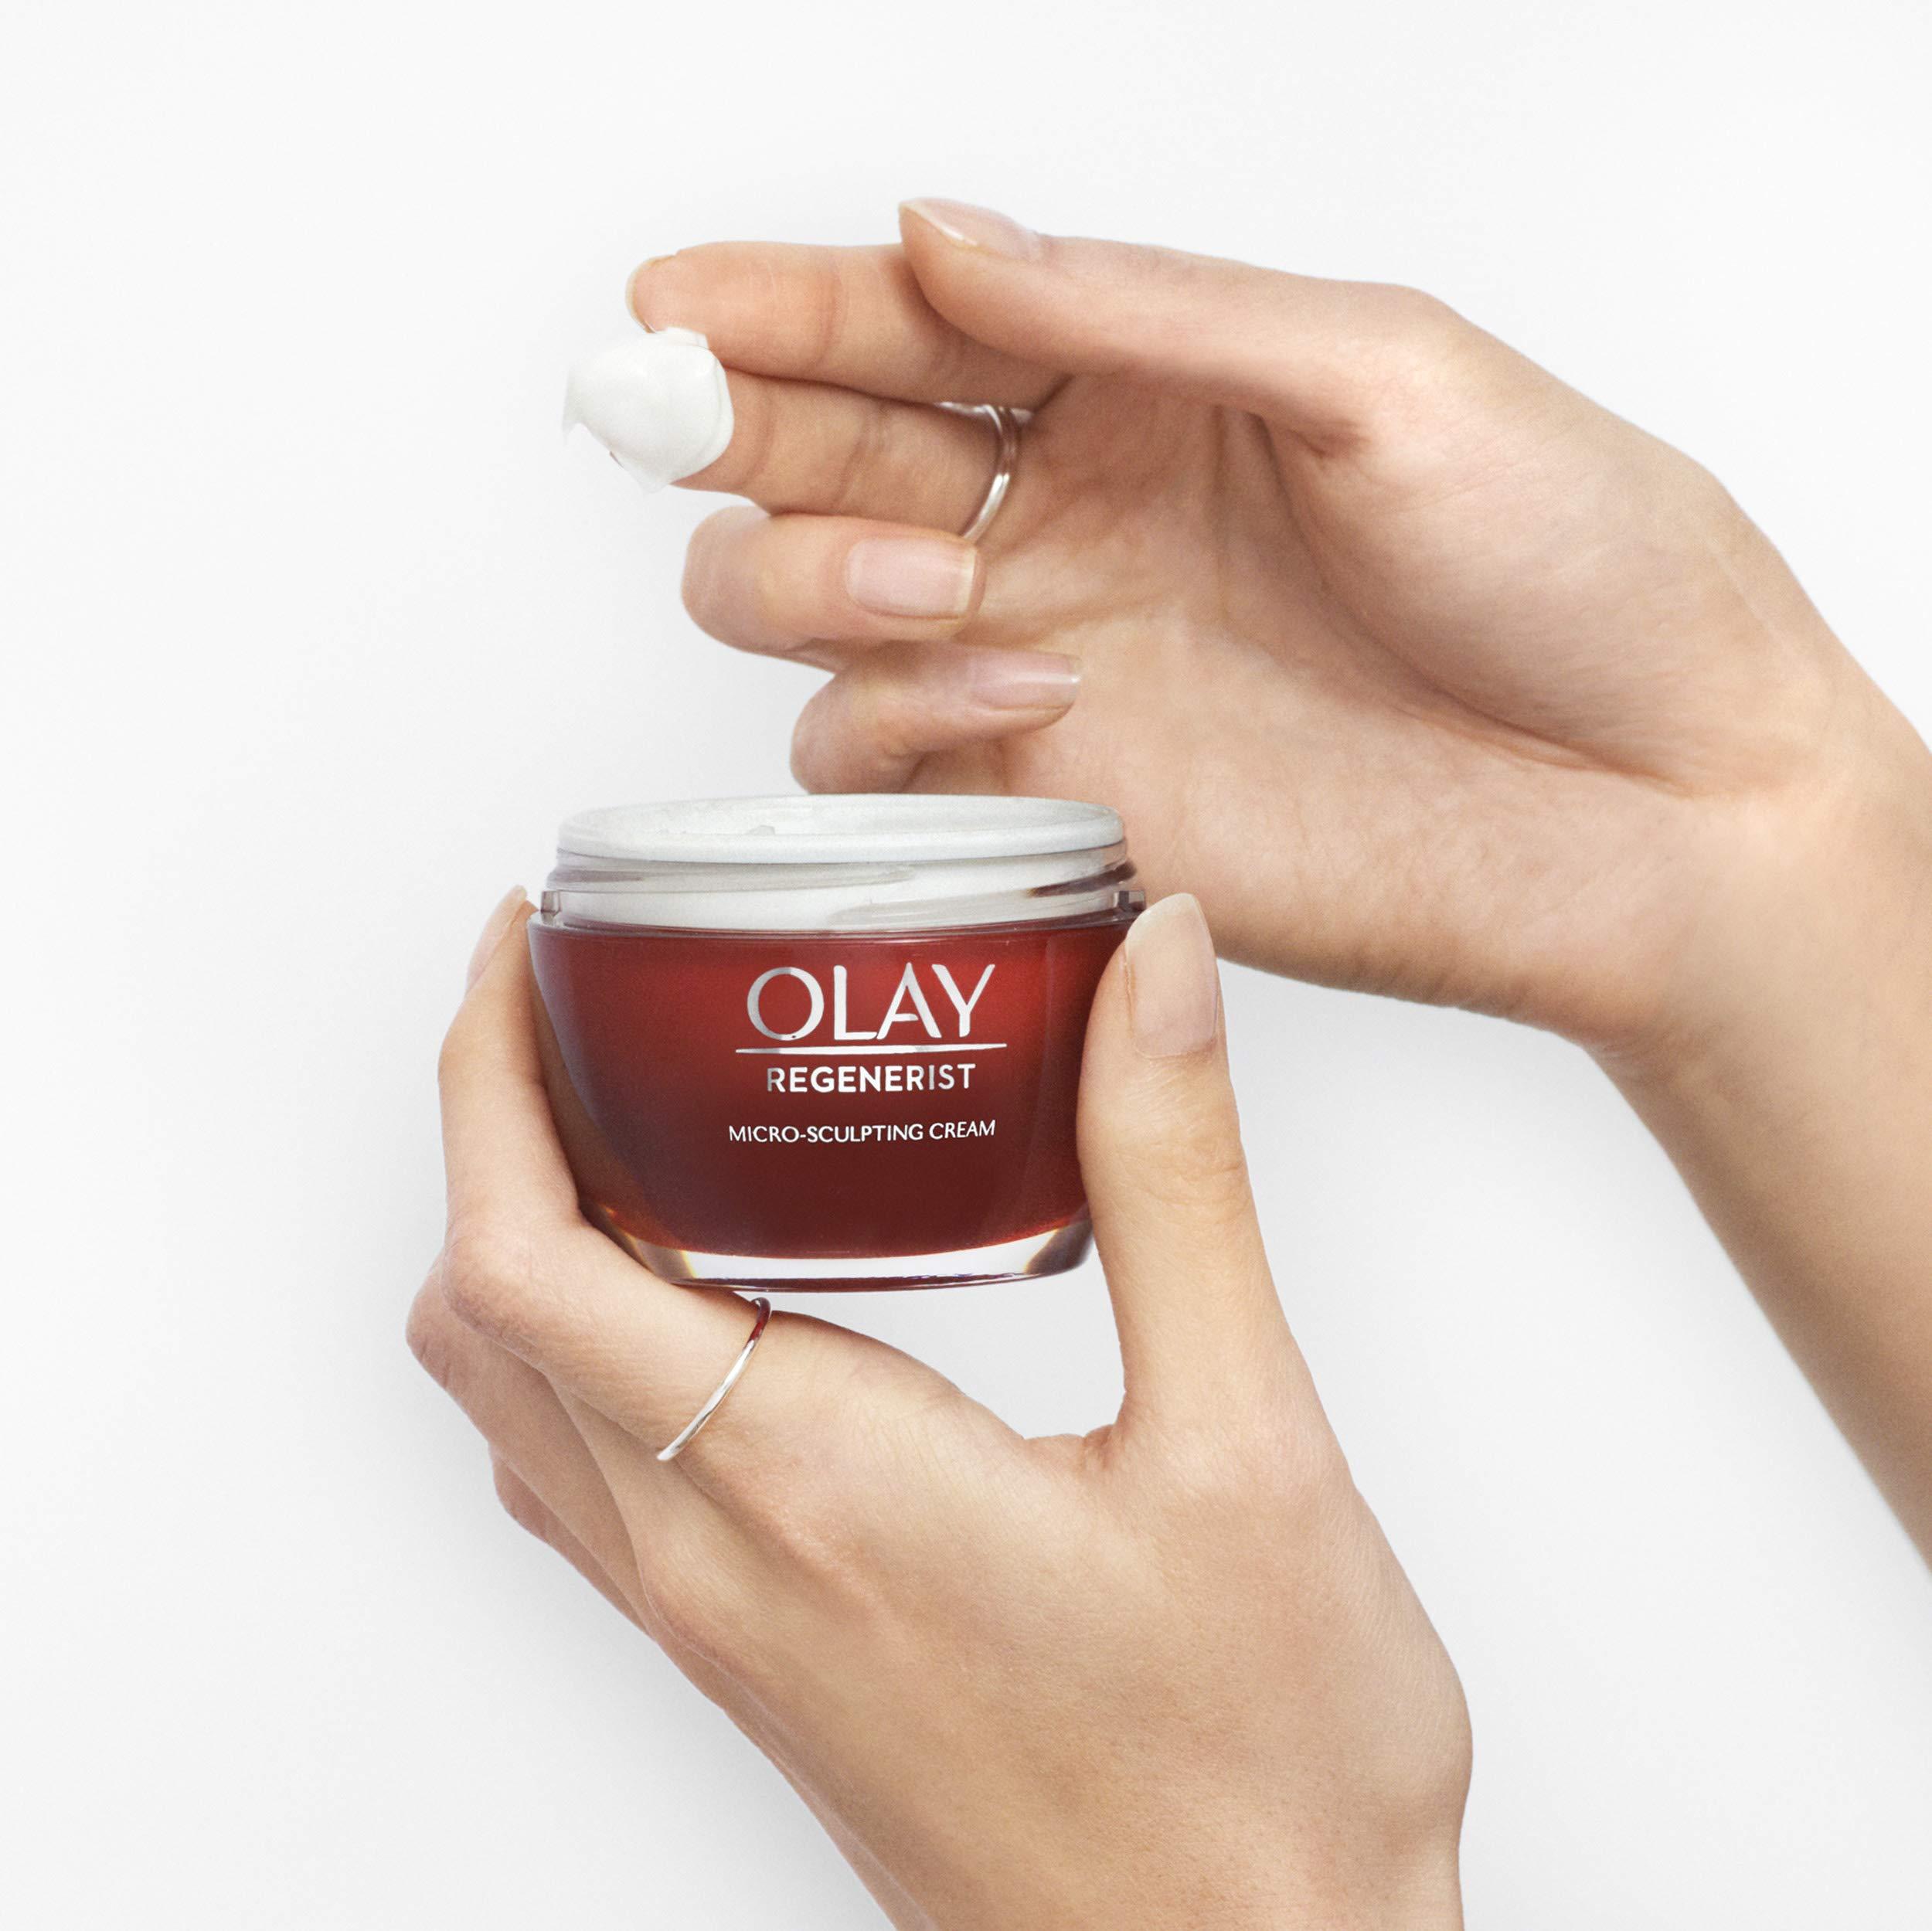 Olay Regenerist Micro-Sculpting Cream, Face Moisturizer with Hyaluronic Acid & Vitamin B3+